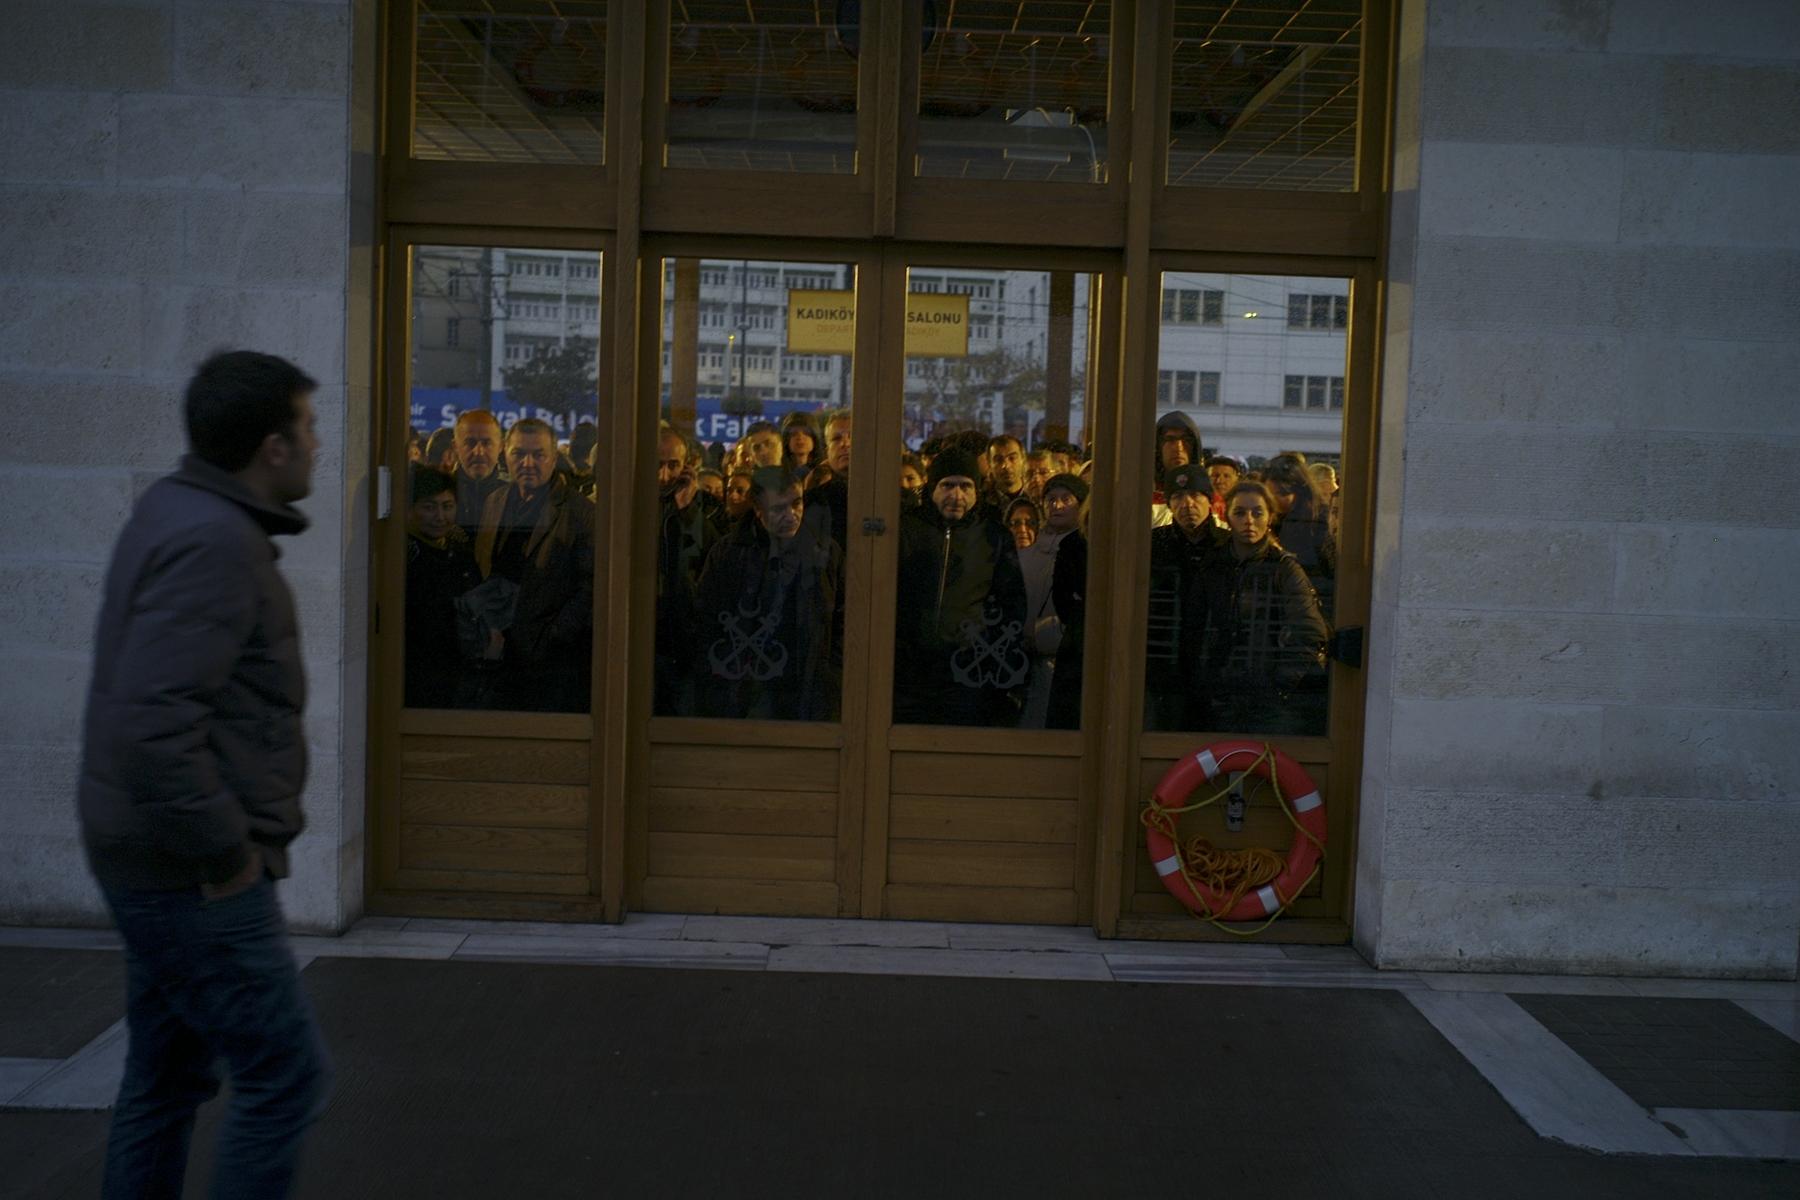 L1000814/ Стамбул, ноябрь 2011